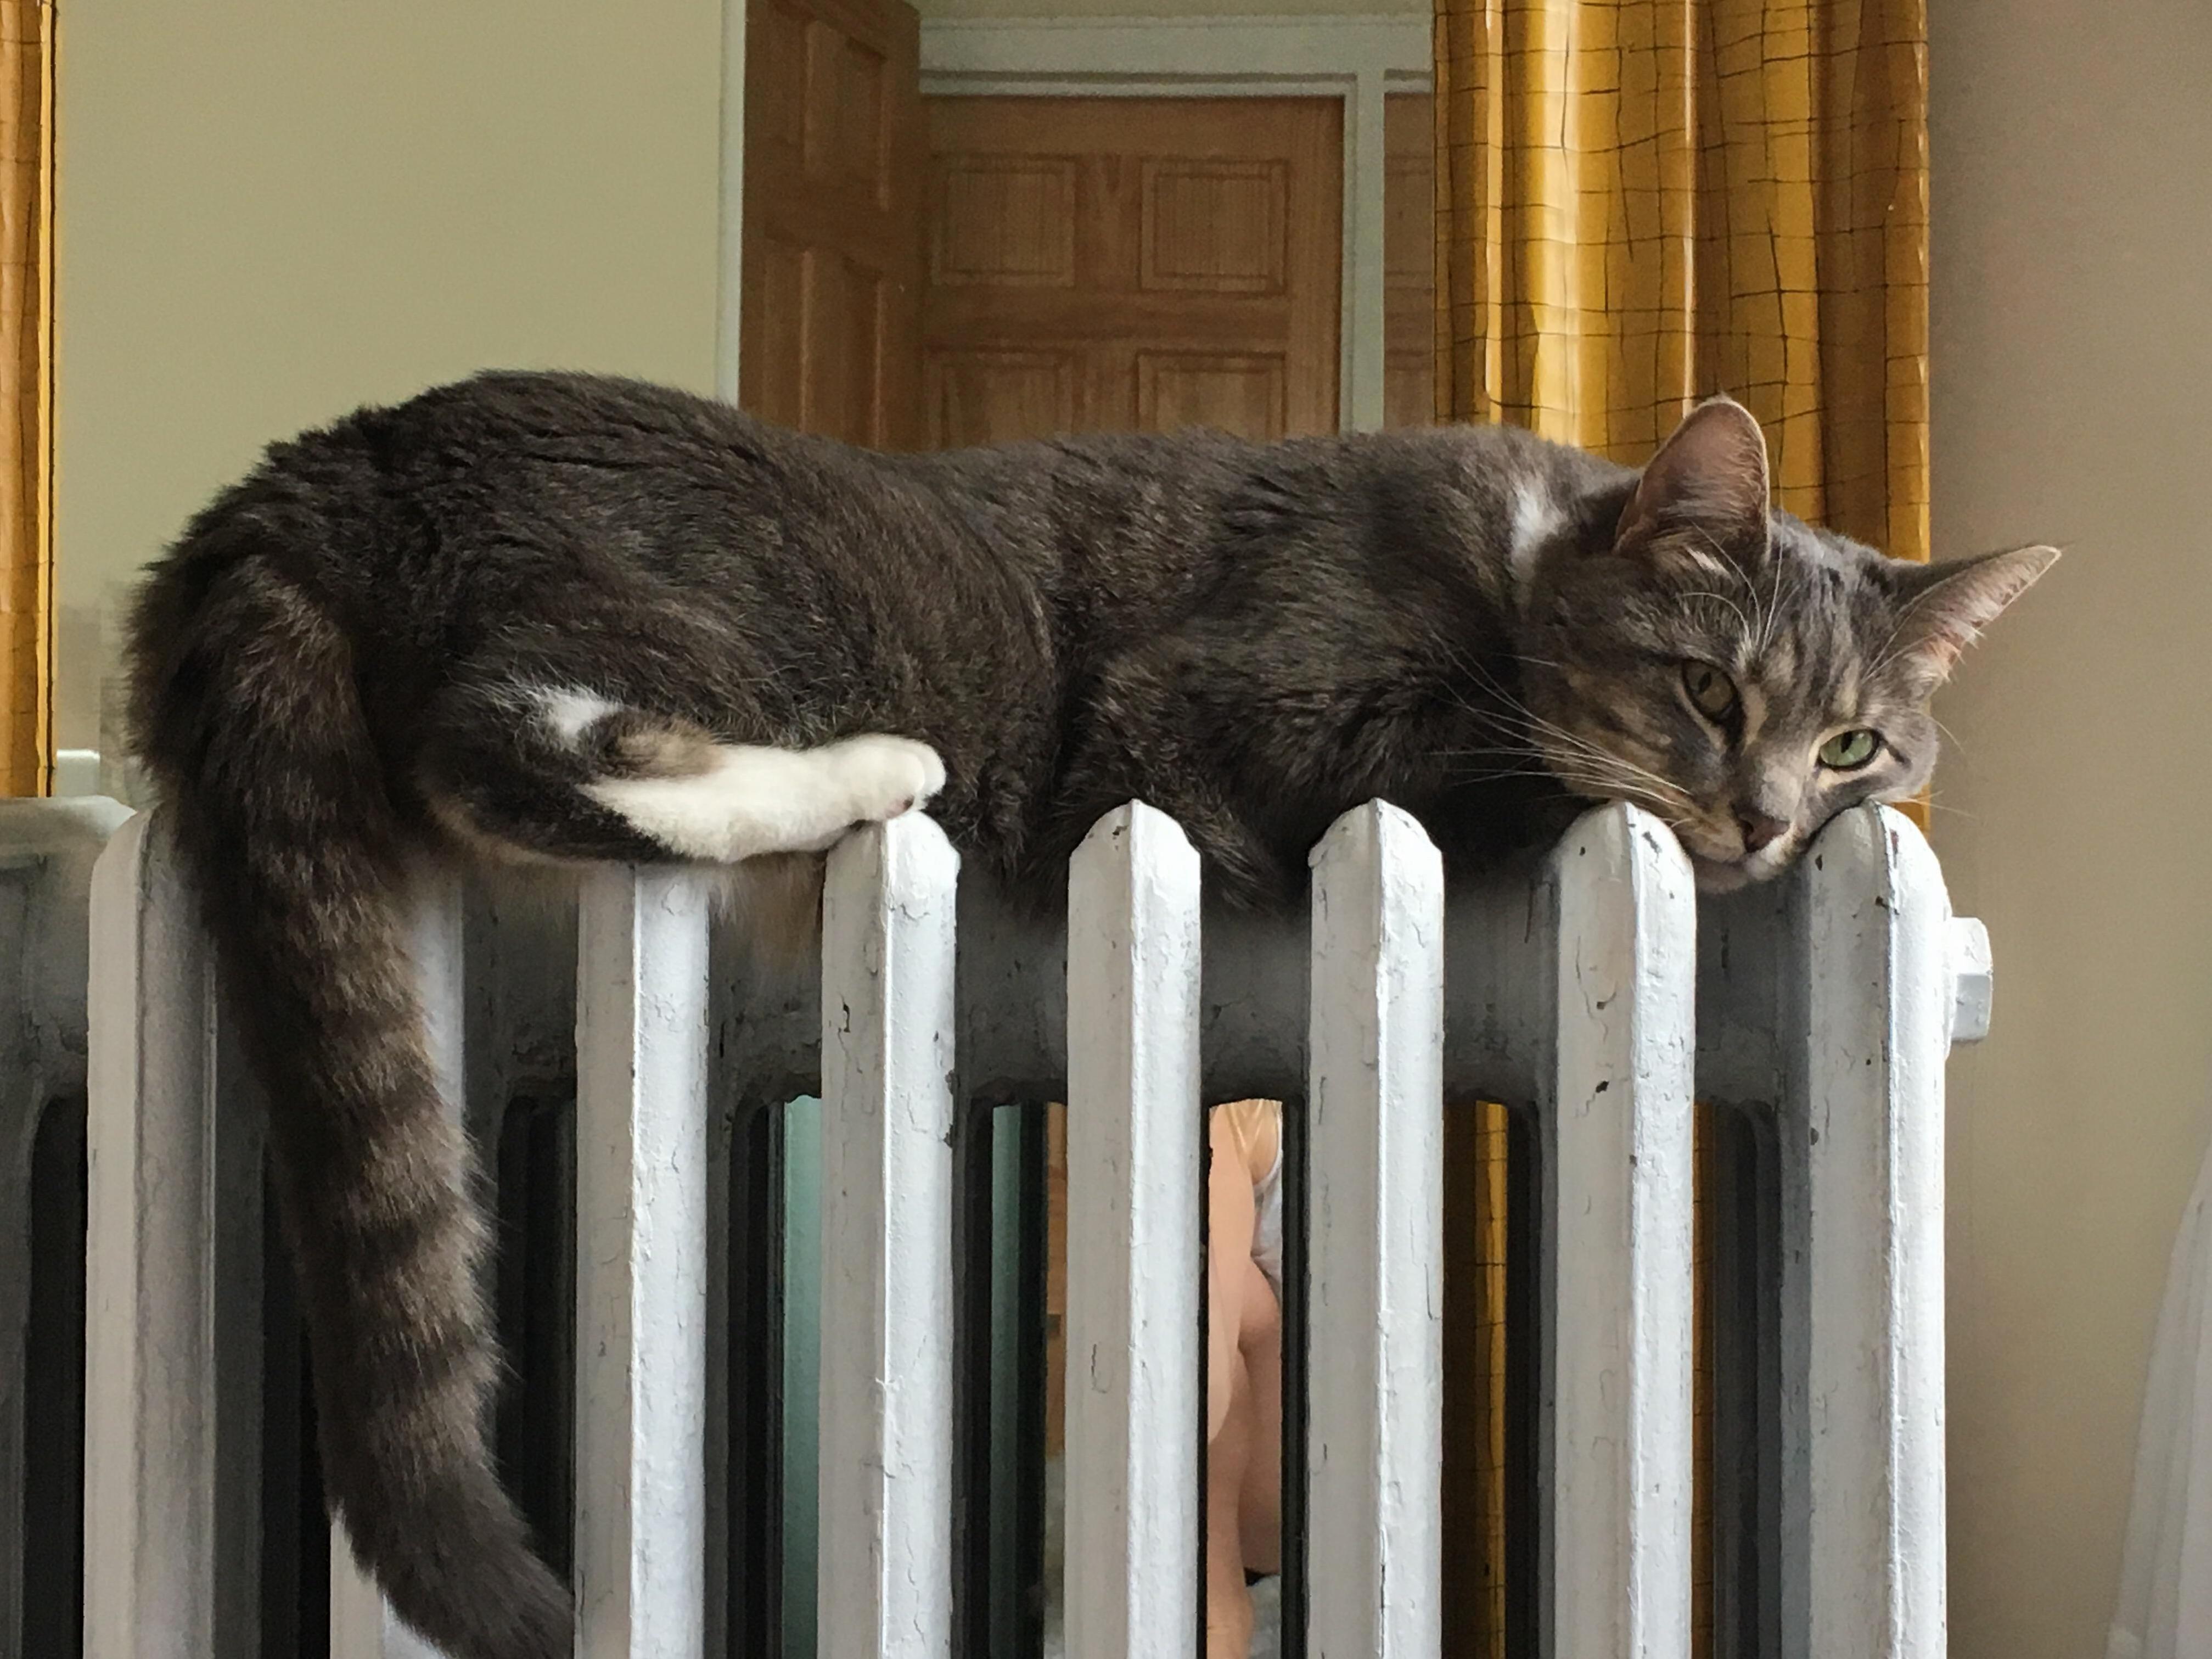 Bella loves sleeping on the radiator